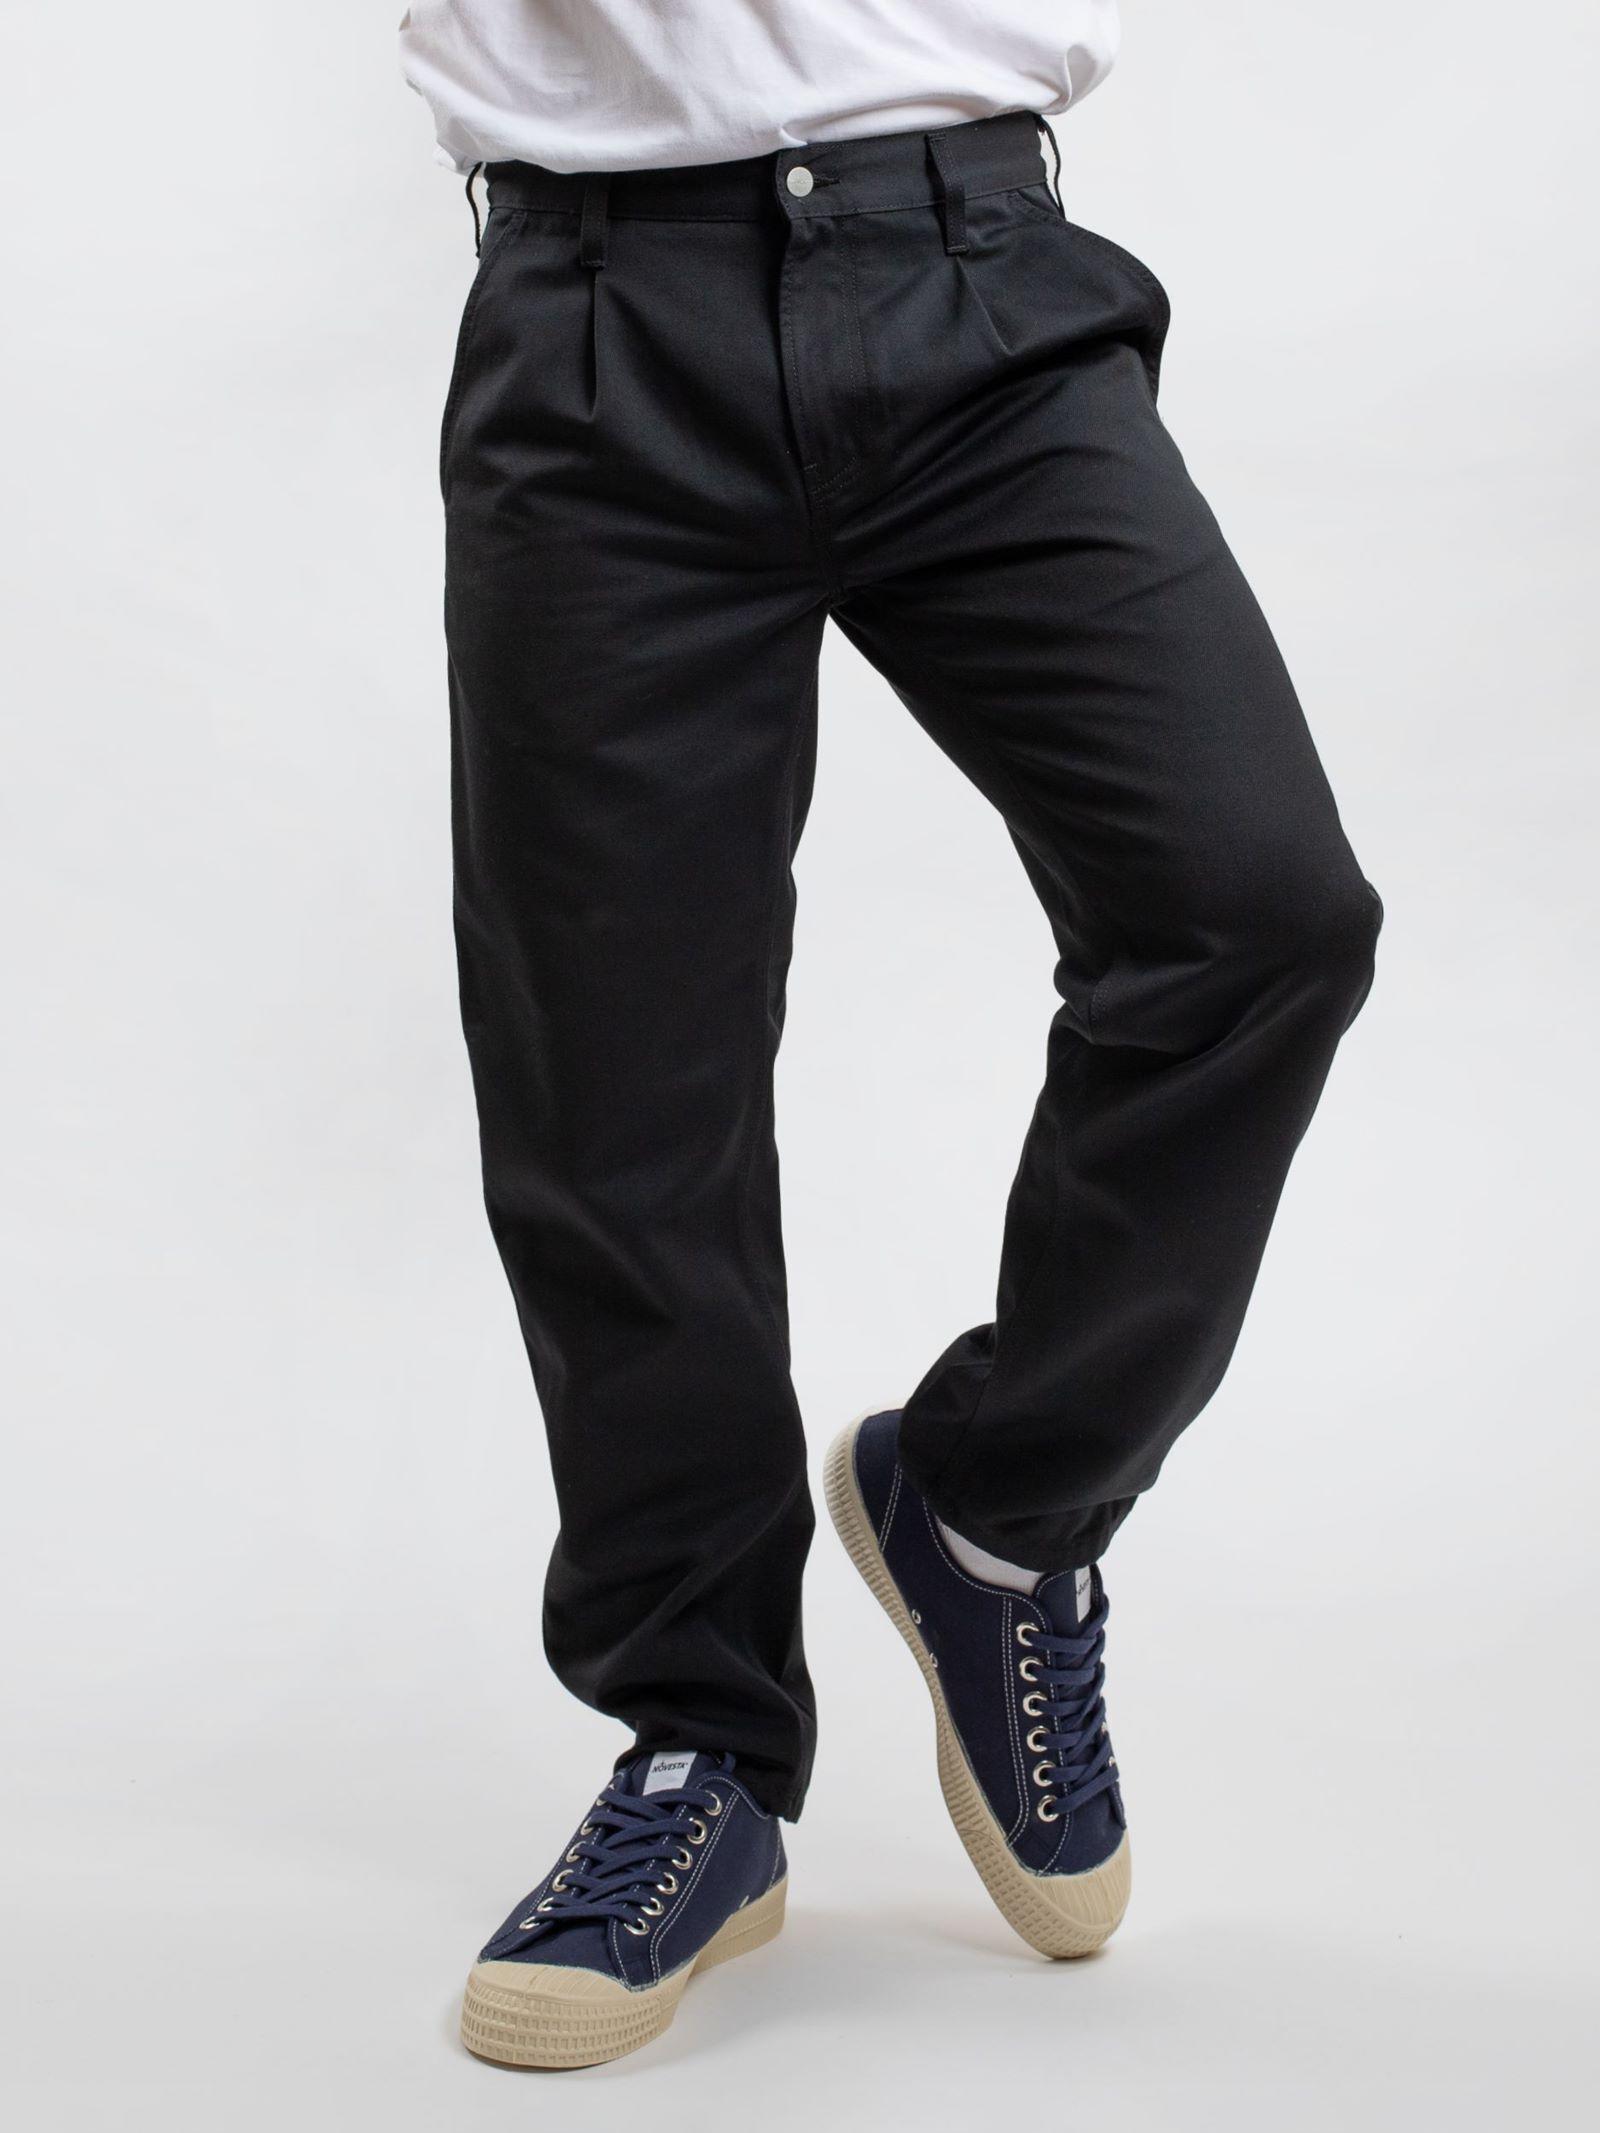 Carhartt WIP Men's Abbott Pant In Black/Rinsed  - Black - Size: 36